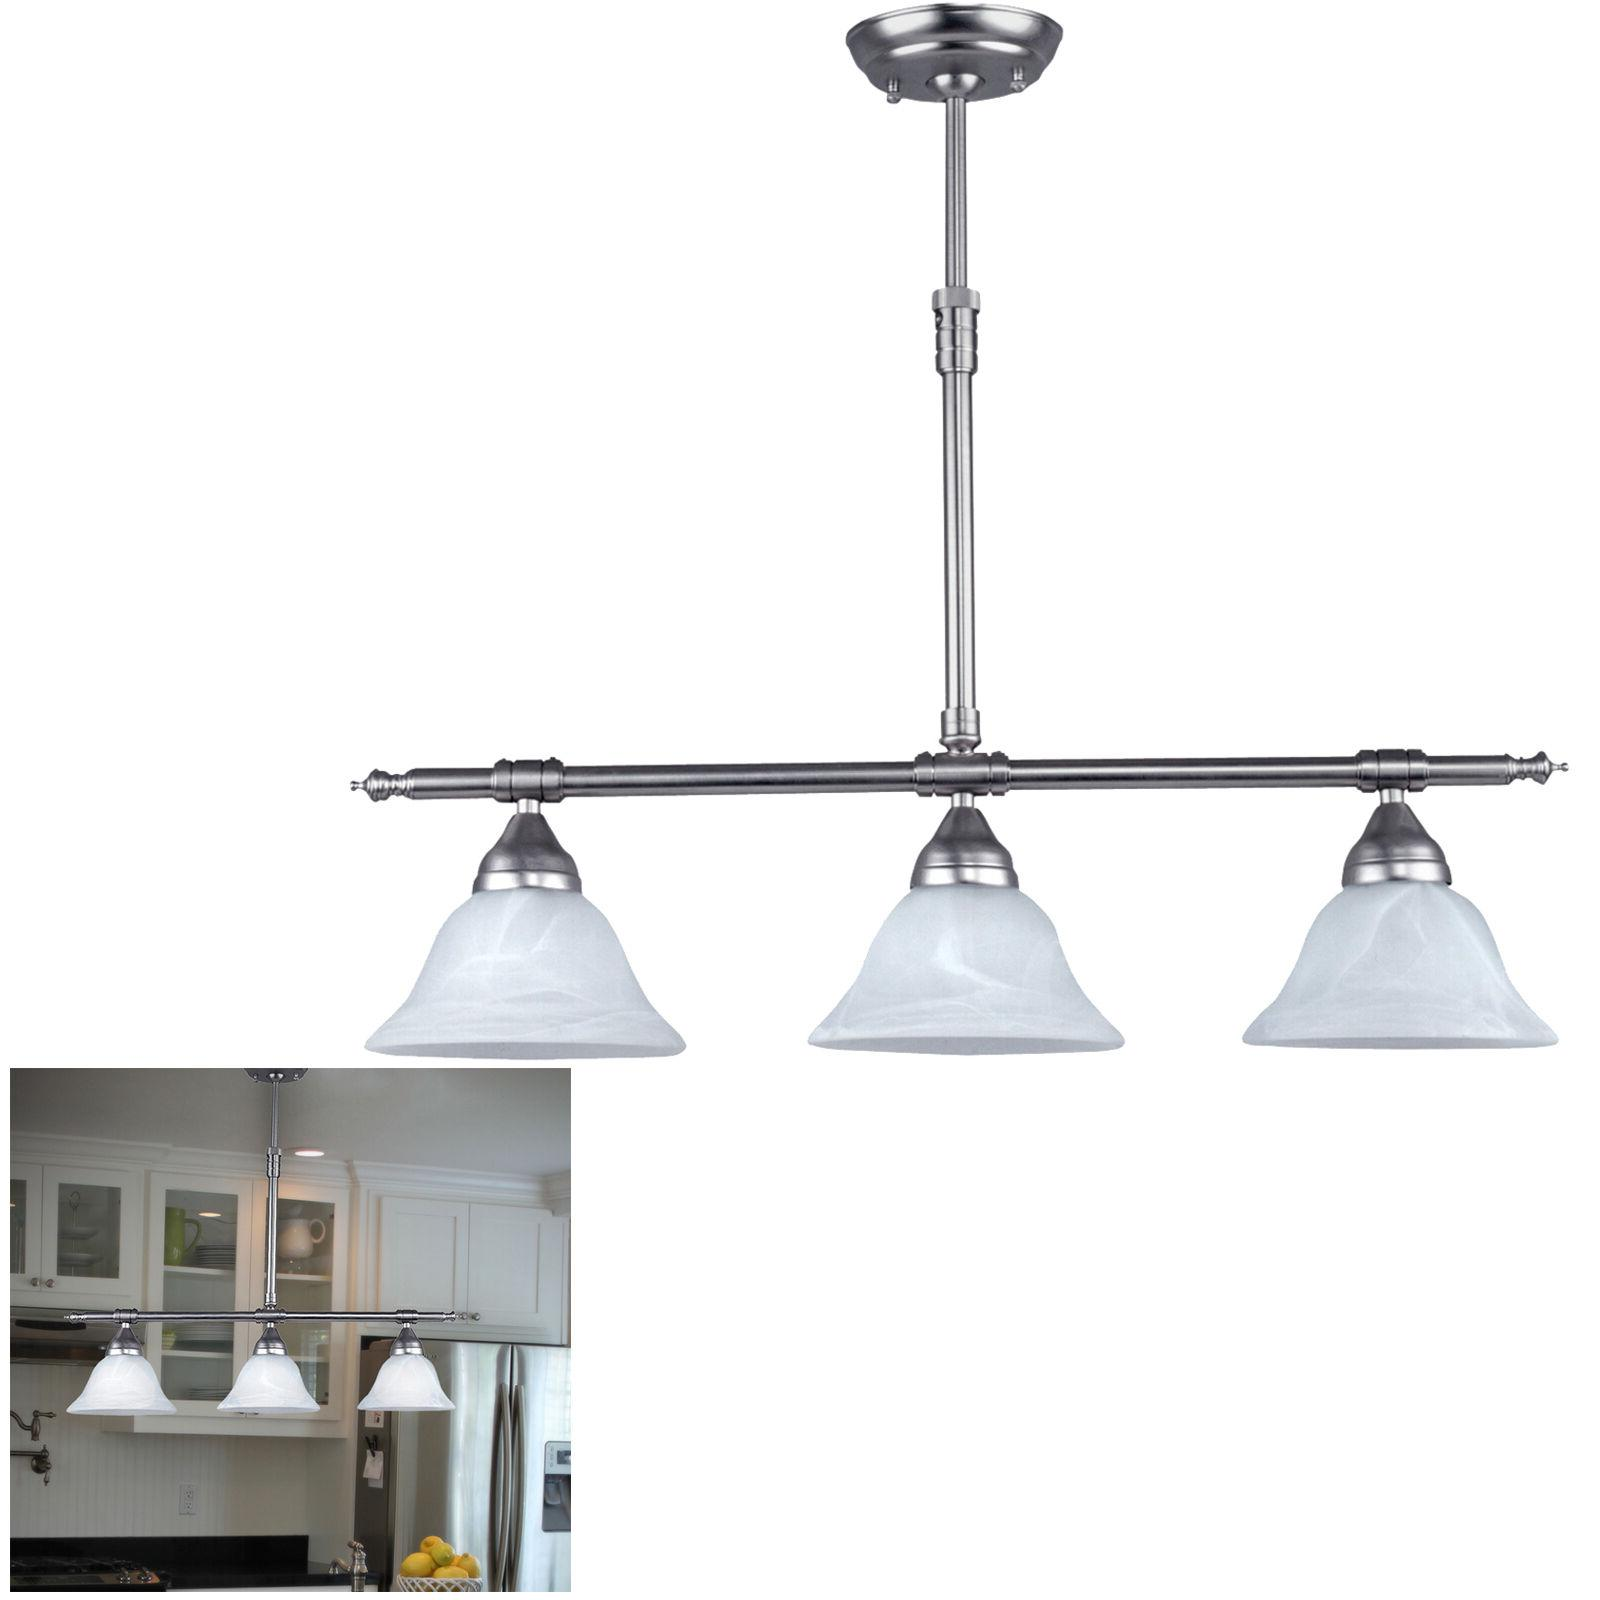 Brushed Nickel Kitchen Island Pendant Light Fixture Dining,